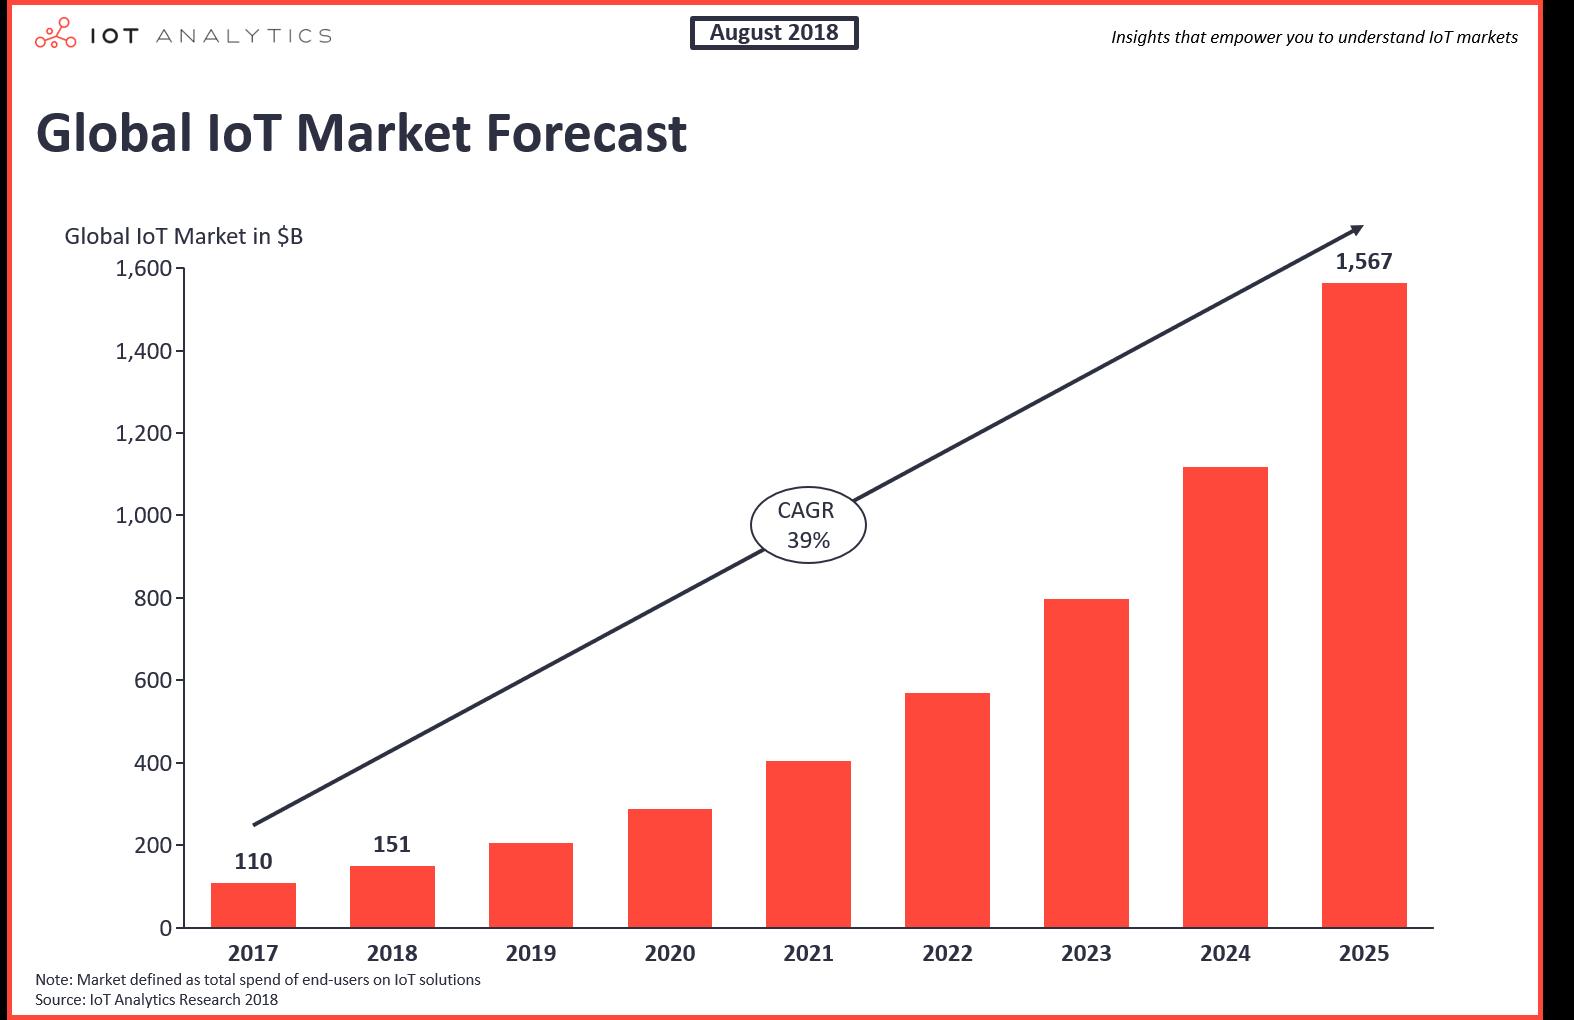 Global IoT Market Forecast 2017 - 2025